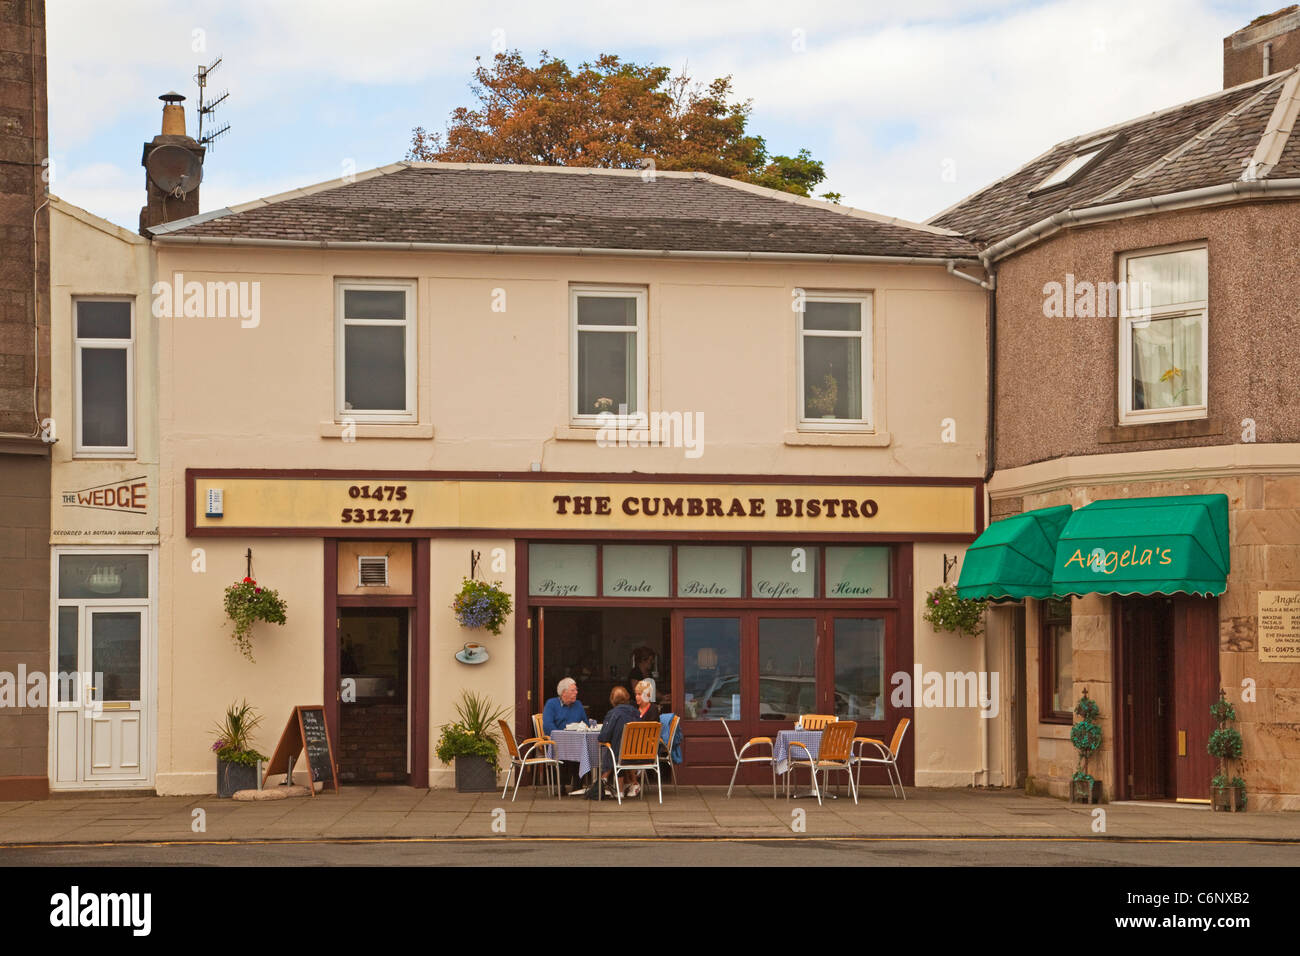 The Wedge and the Cumbrae Bistro, Millport, Isle of Cumbrae - Stock Image